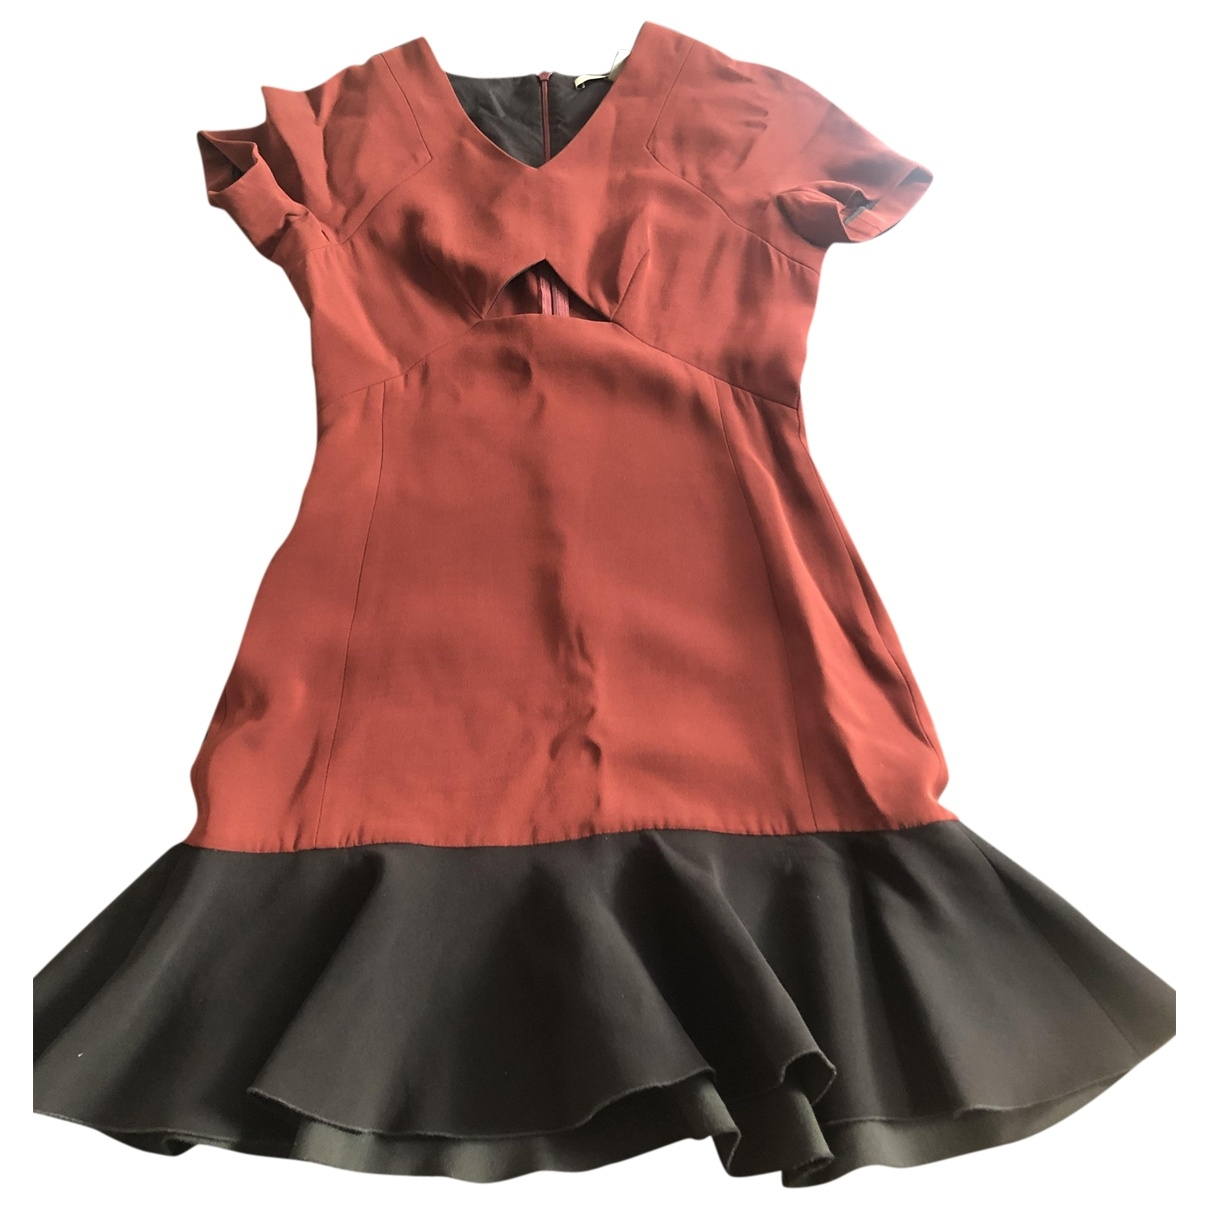 Victoria Beckham \N Burgundy Cotton dress for Women 10 UK